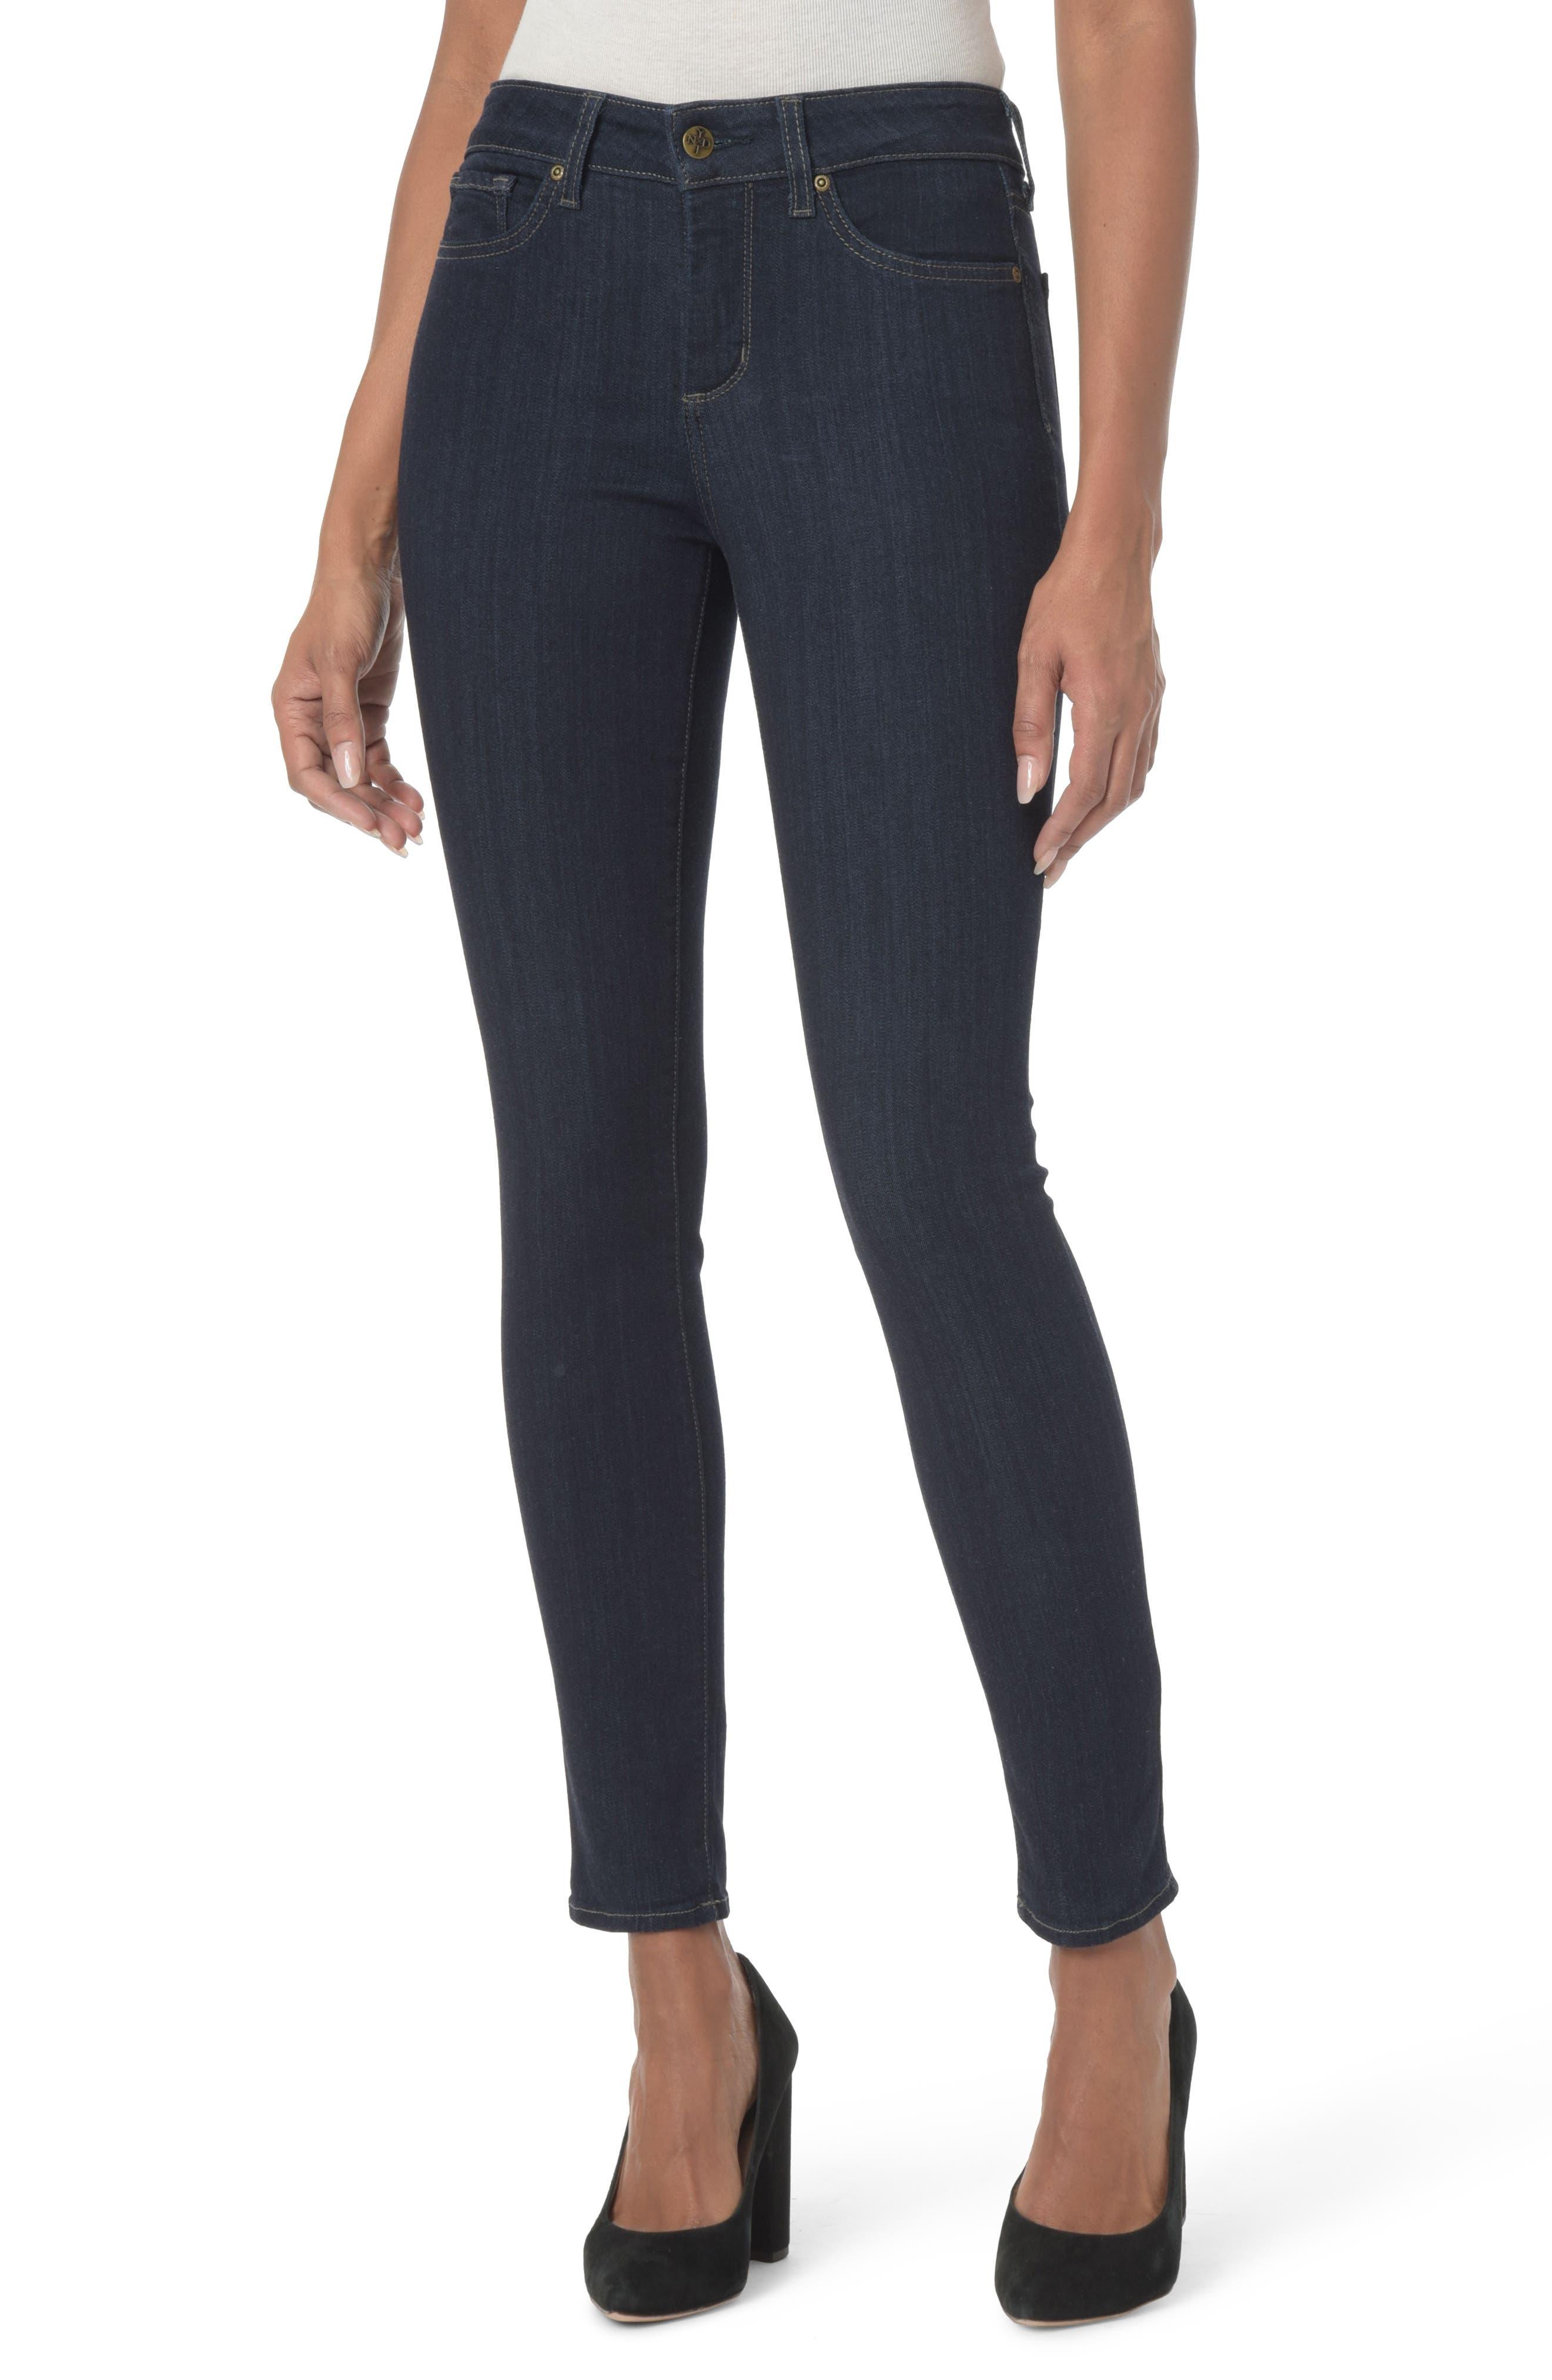 Main Image - NYDJ Ami Stretch Super Skinny Jeans (Regular & Petite)